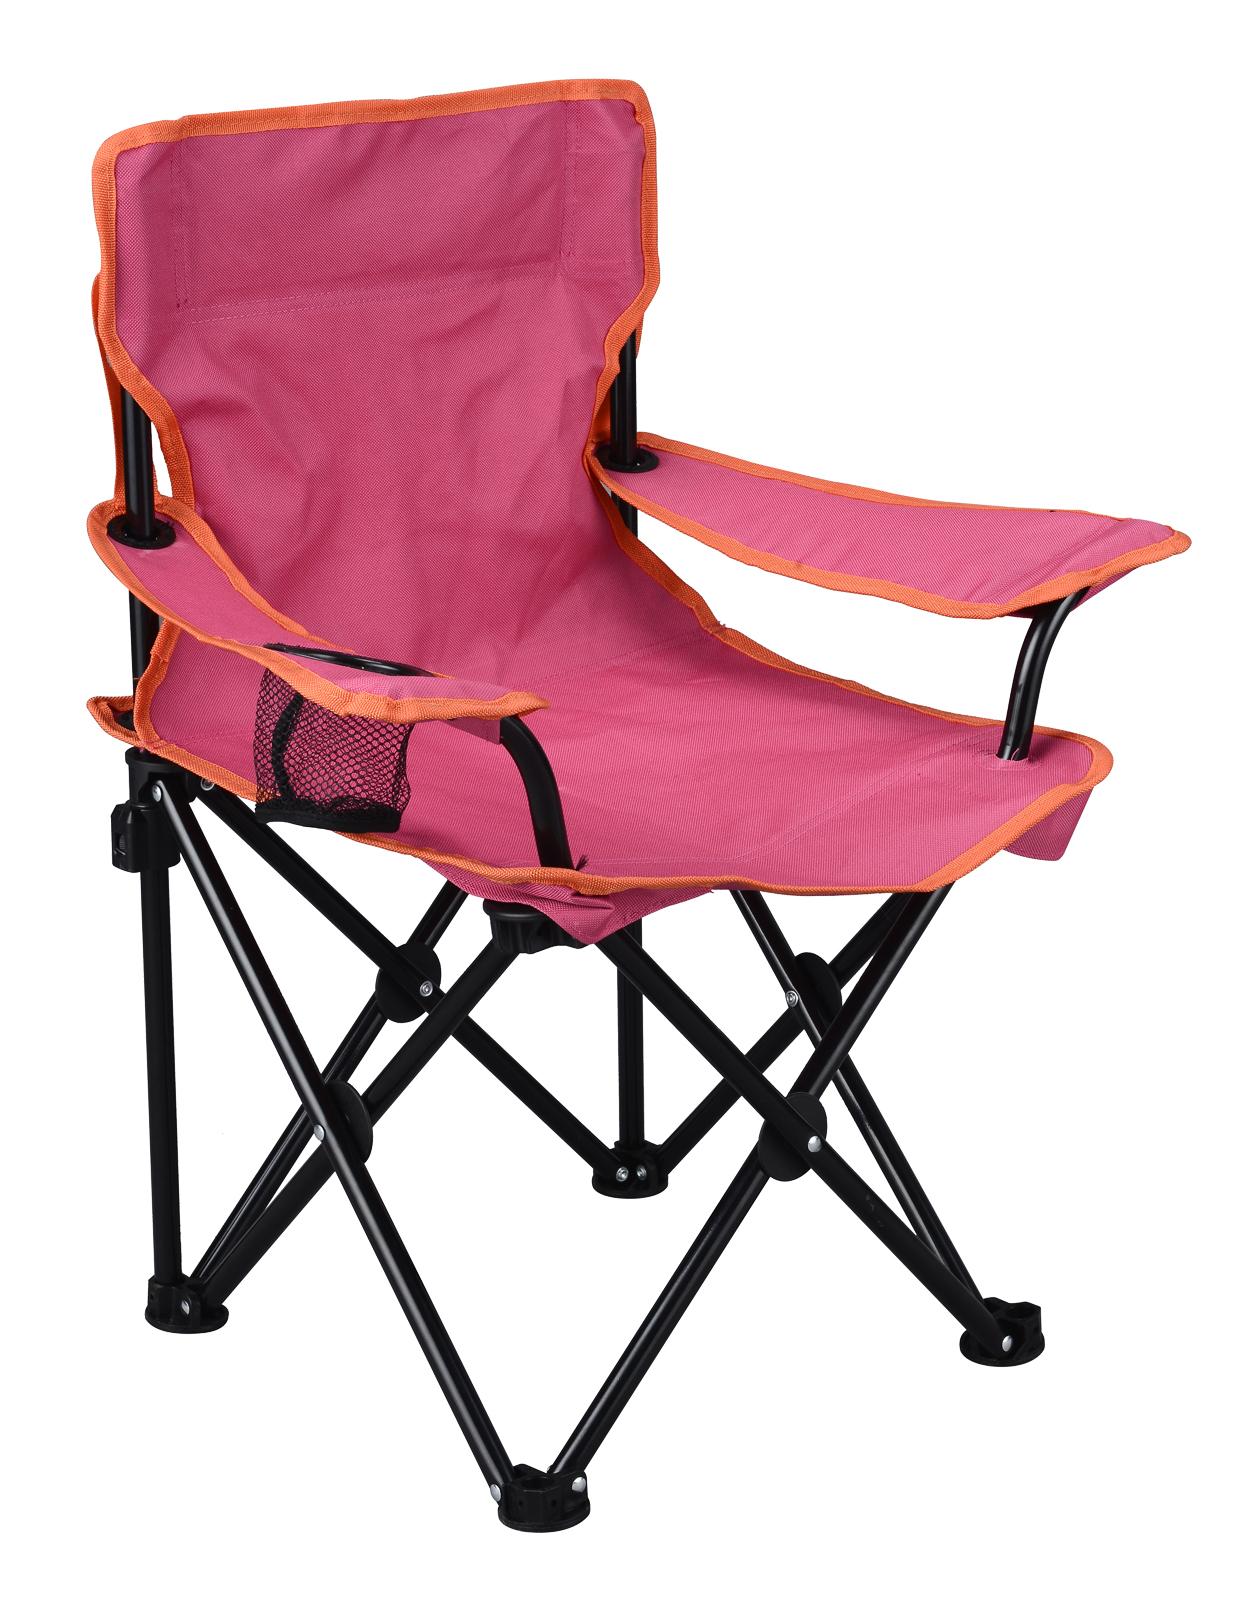 plastic chairs kmart tempur pedic office chair kids